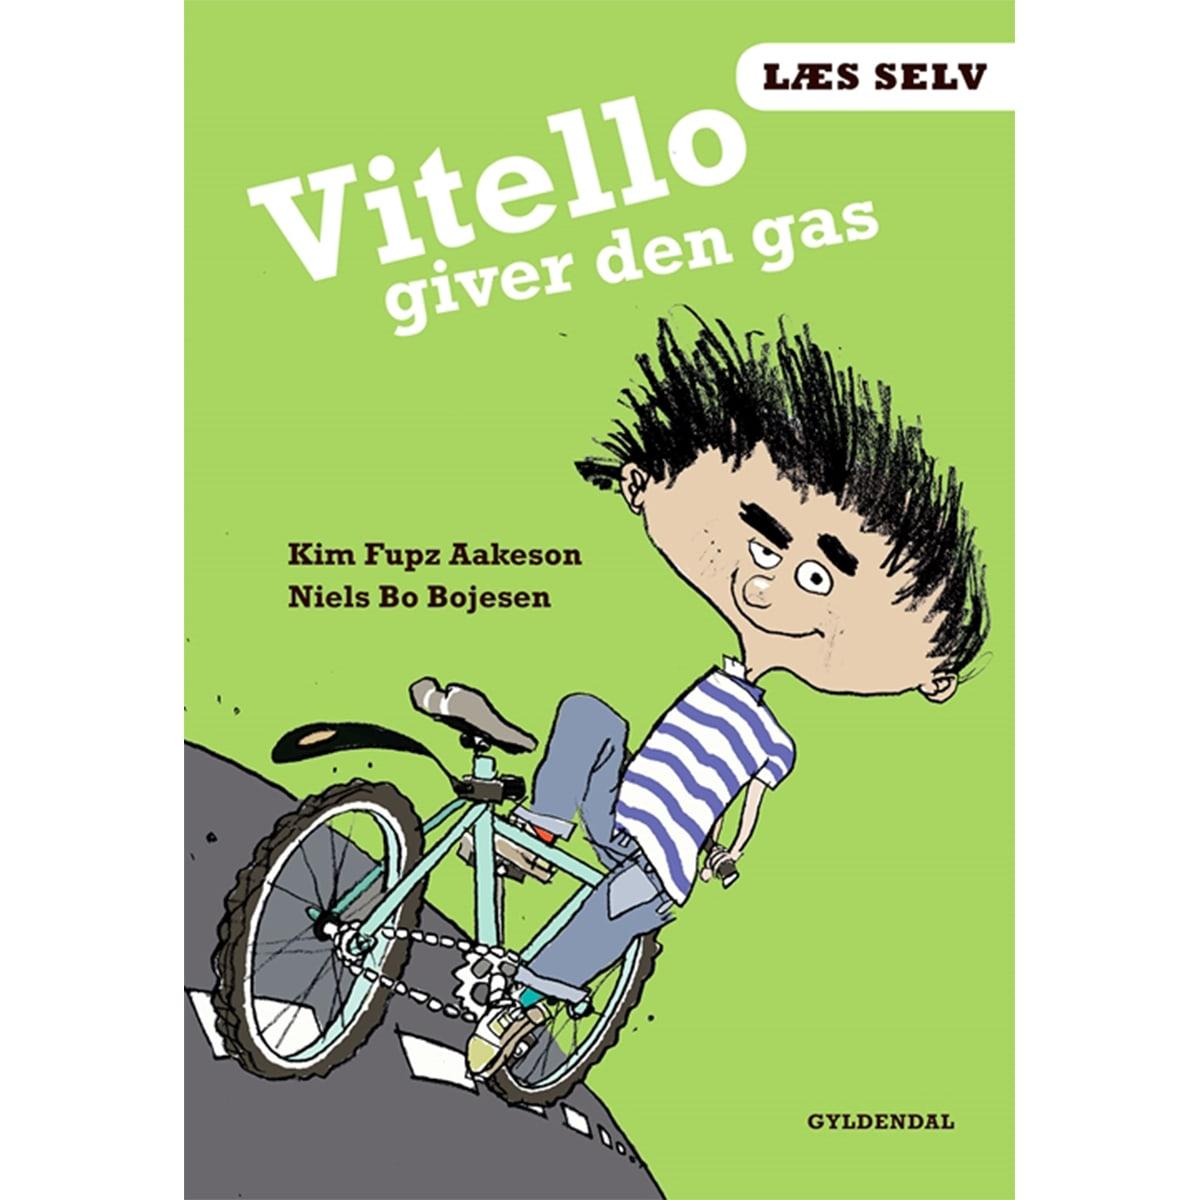 Af Kim Fupz Aakeson & Niels Bo Bojesen